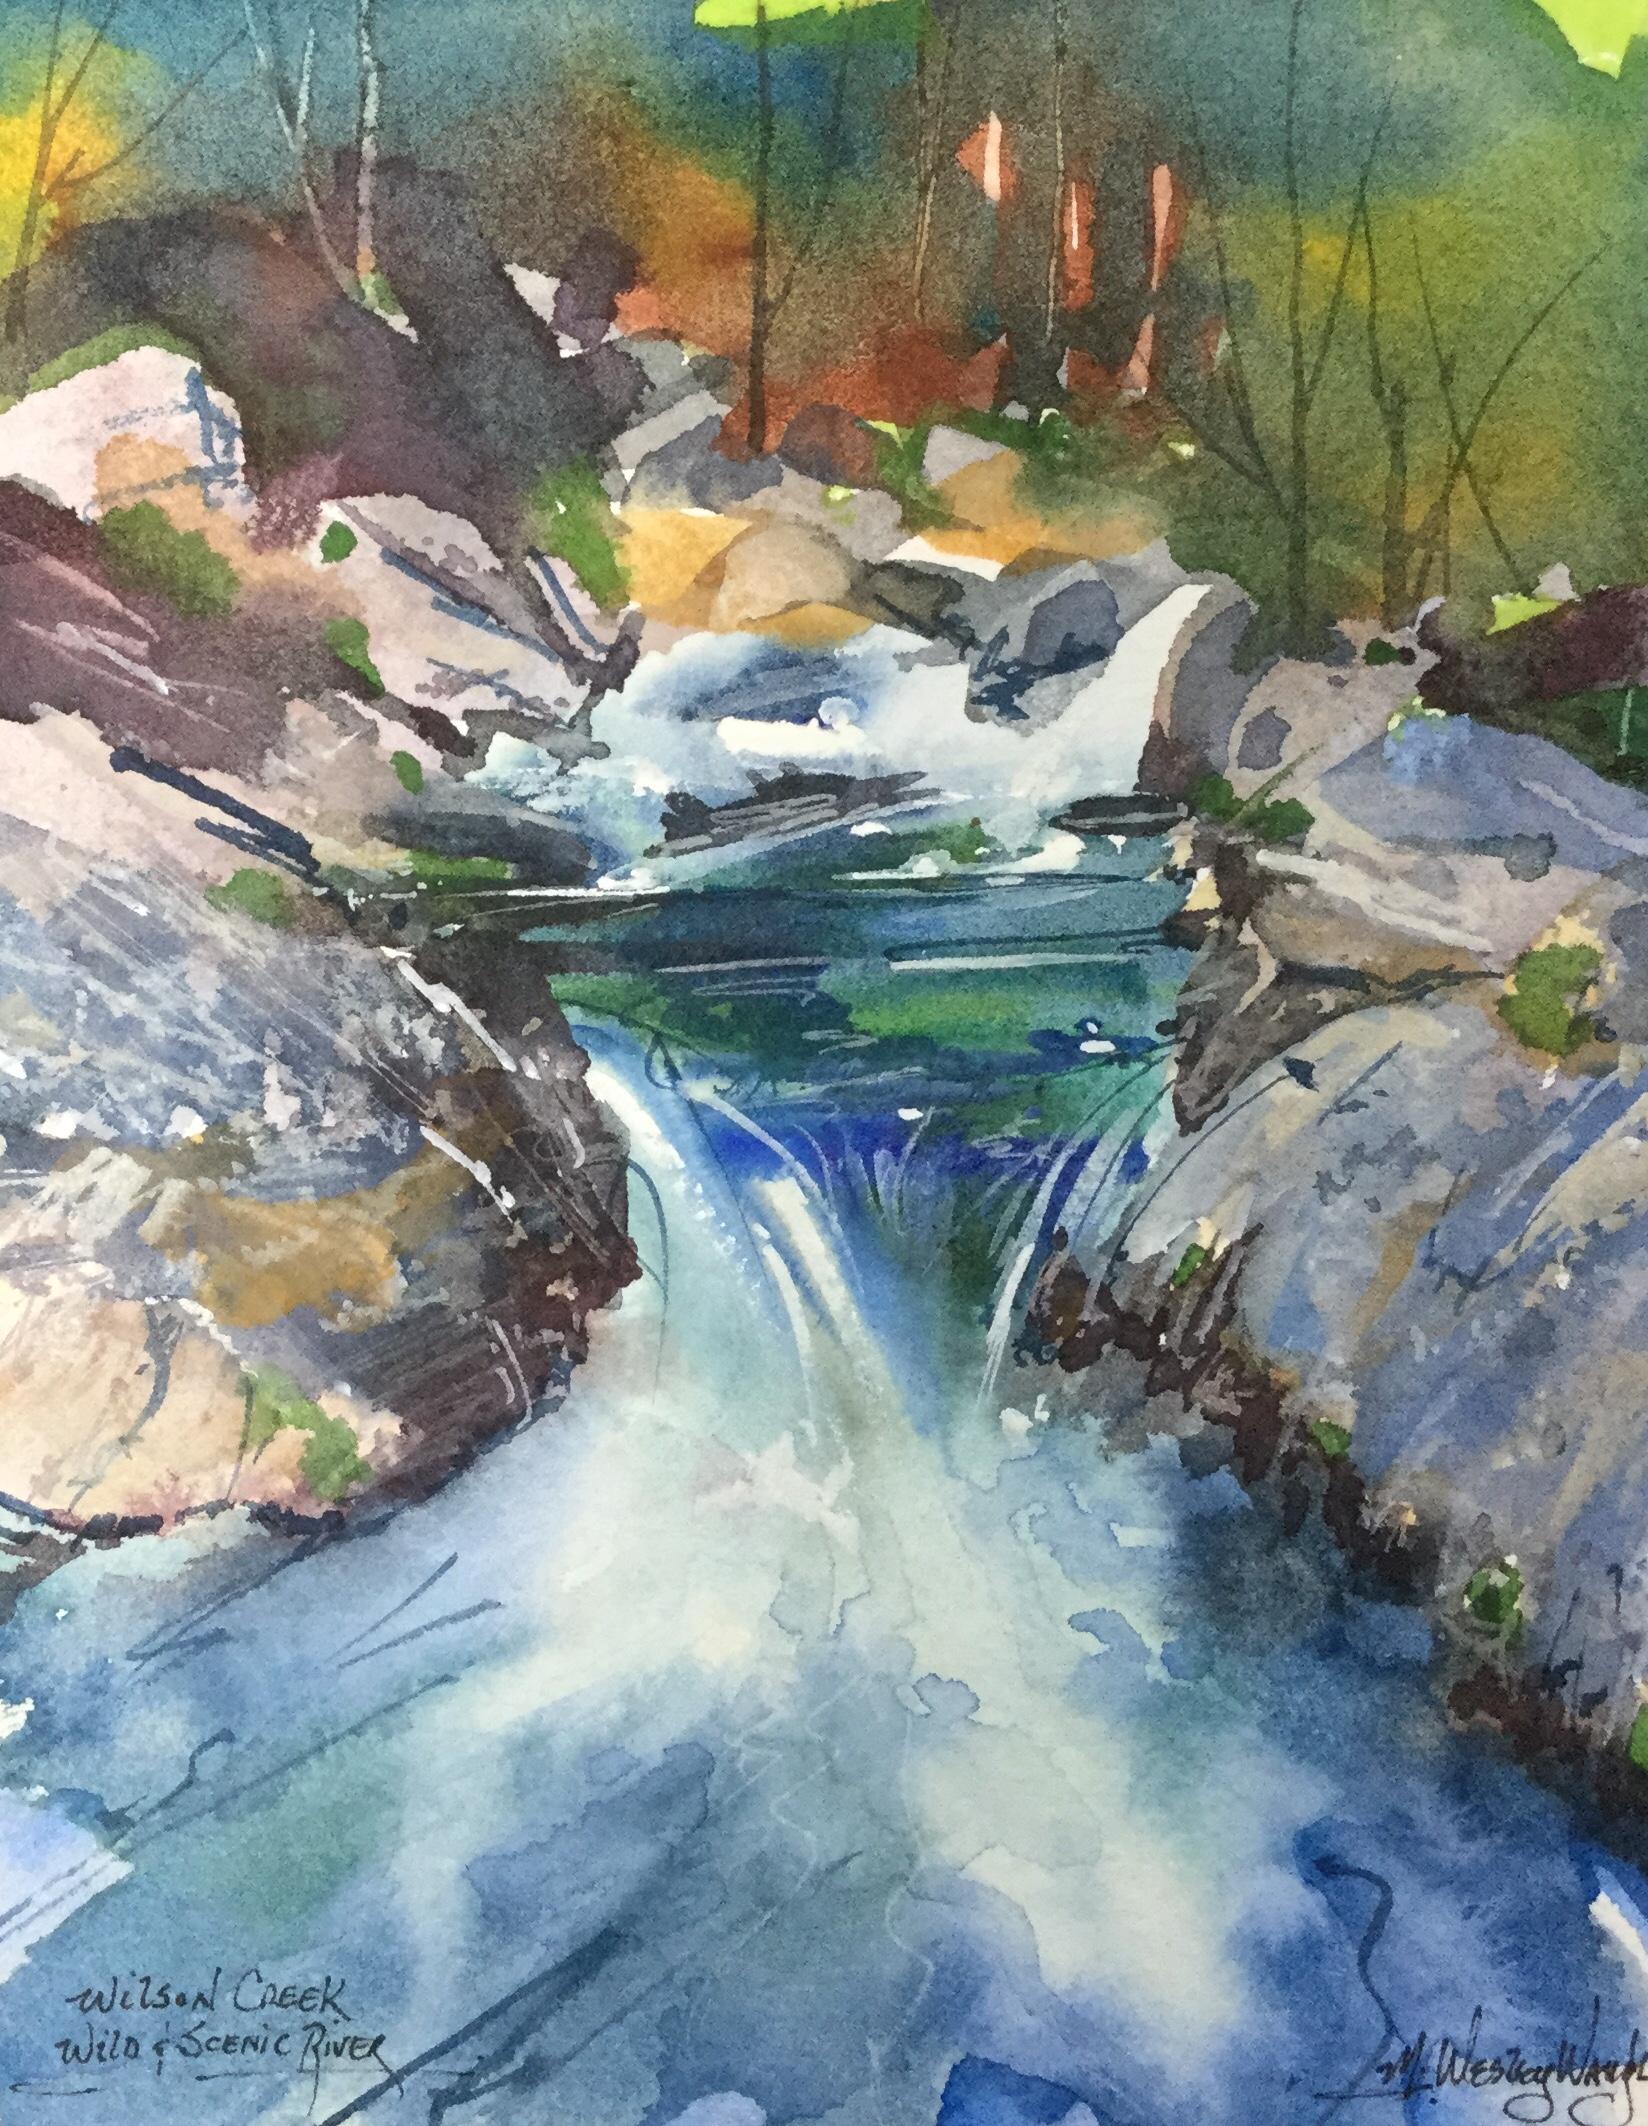 Wilson Creek, Wild and Scenic River